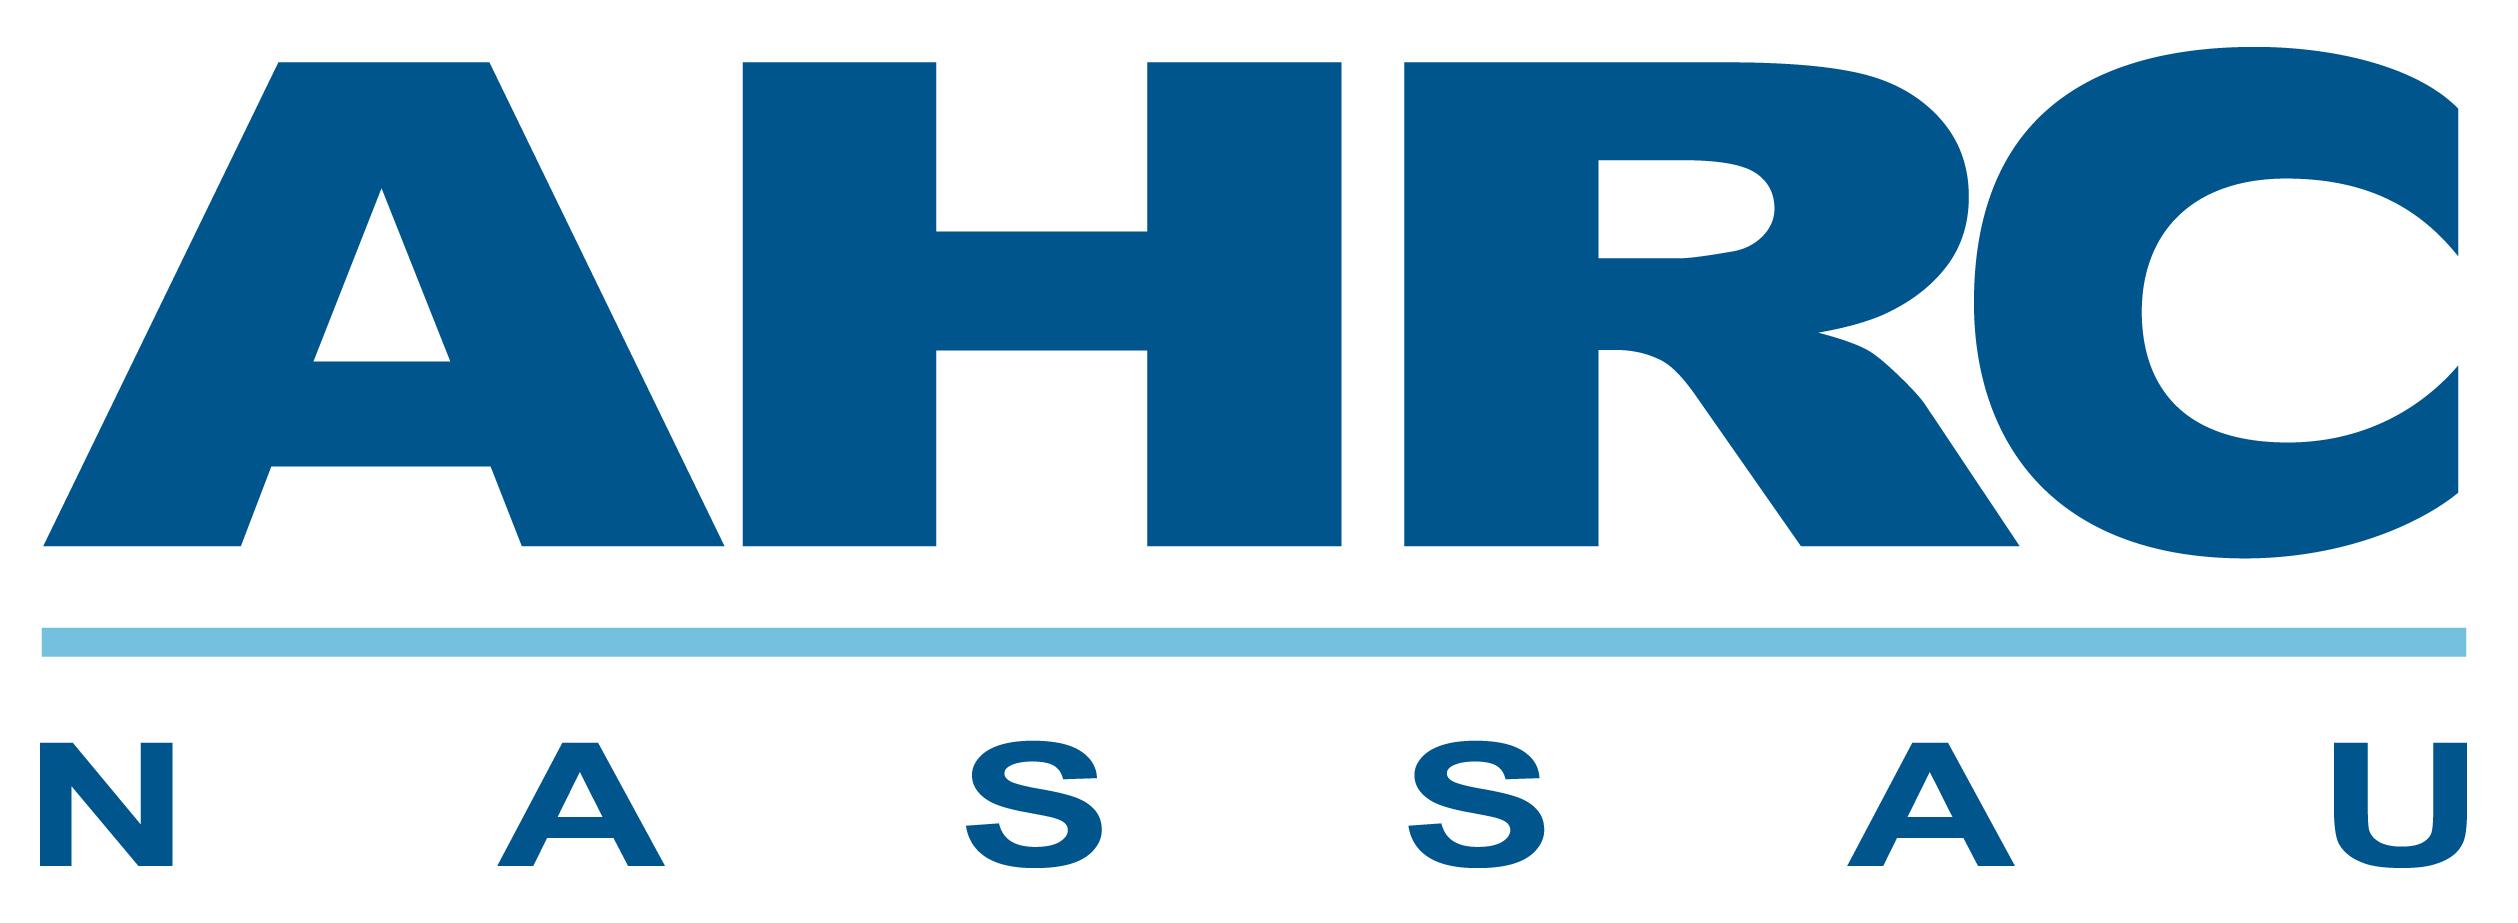 AHRC logo blue.jpg